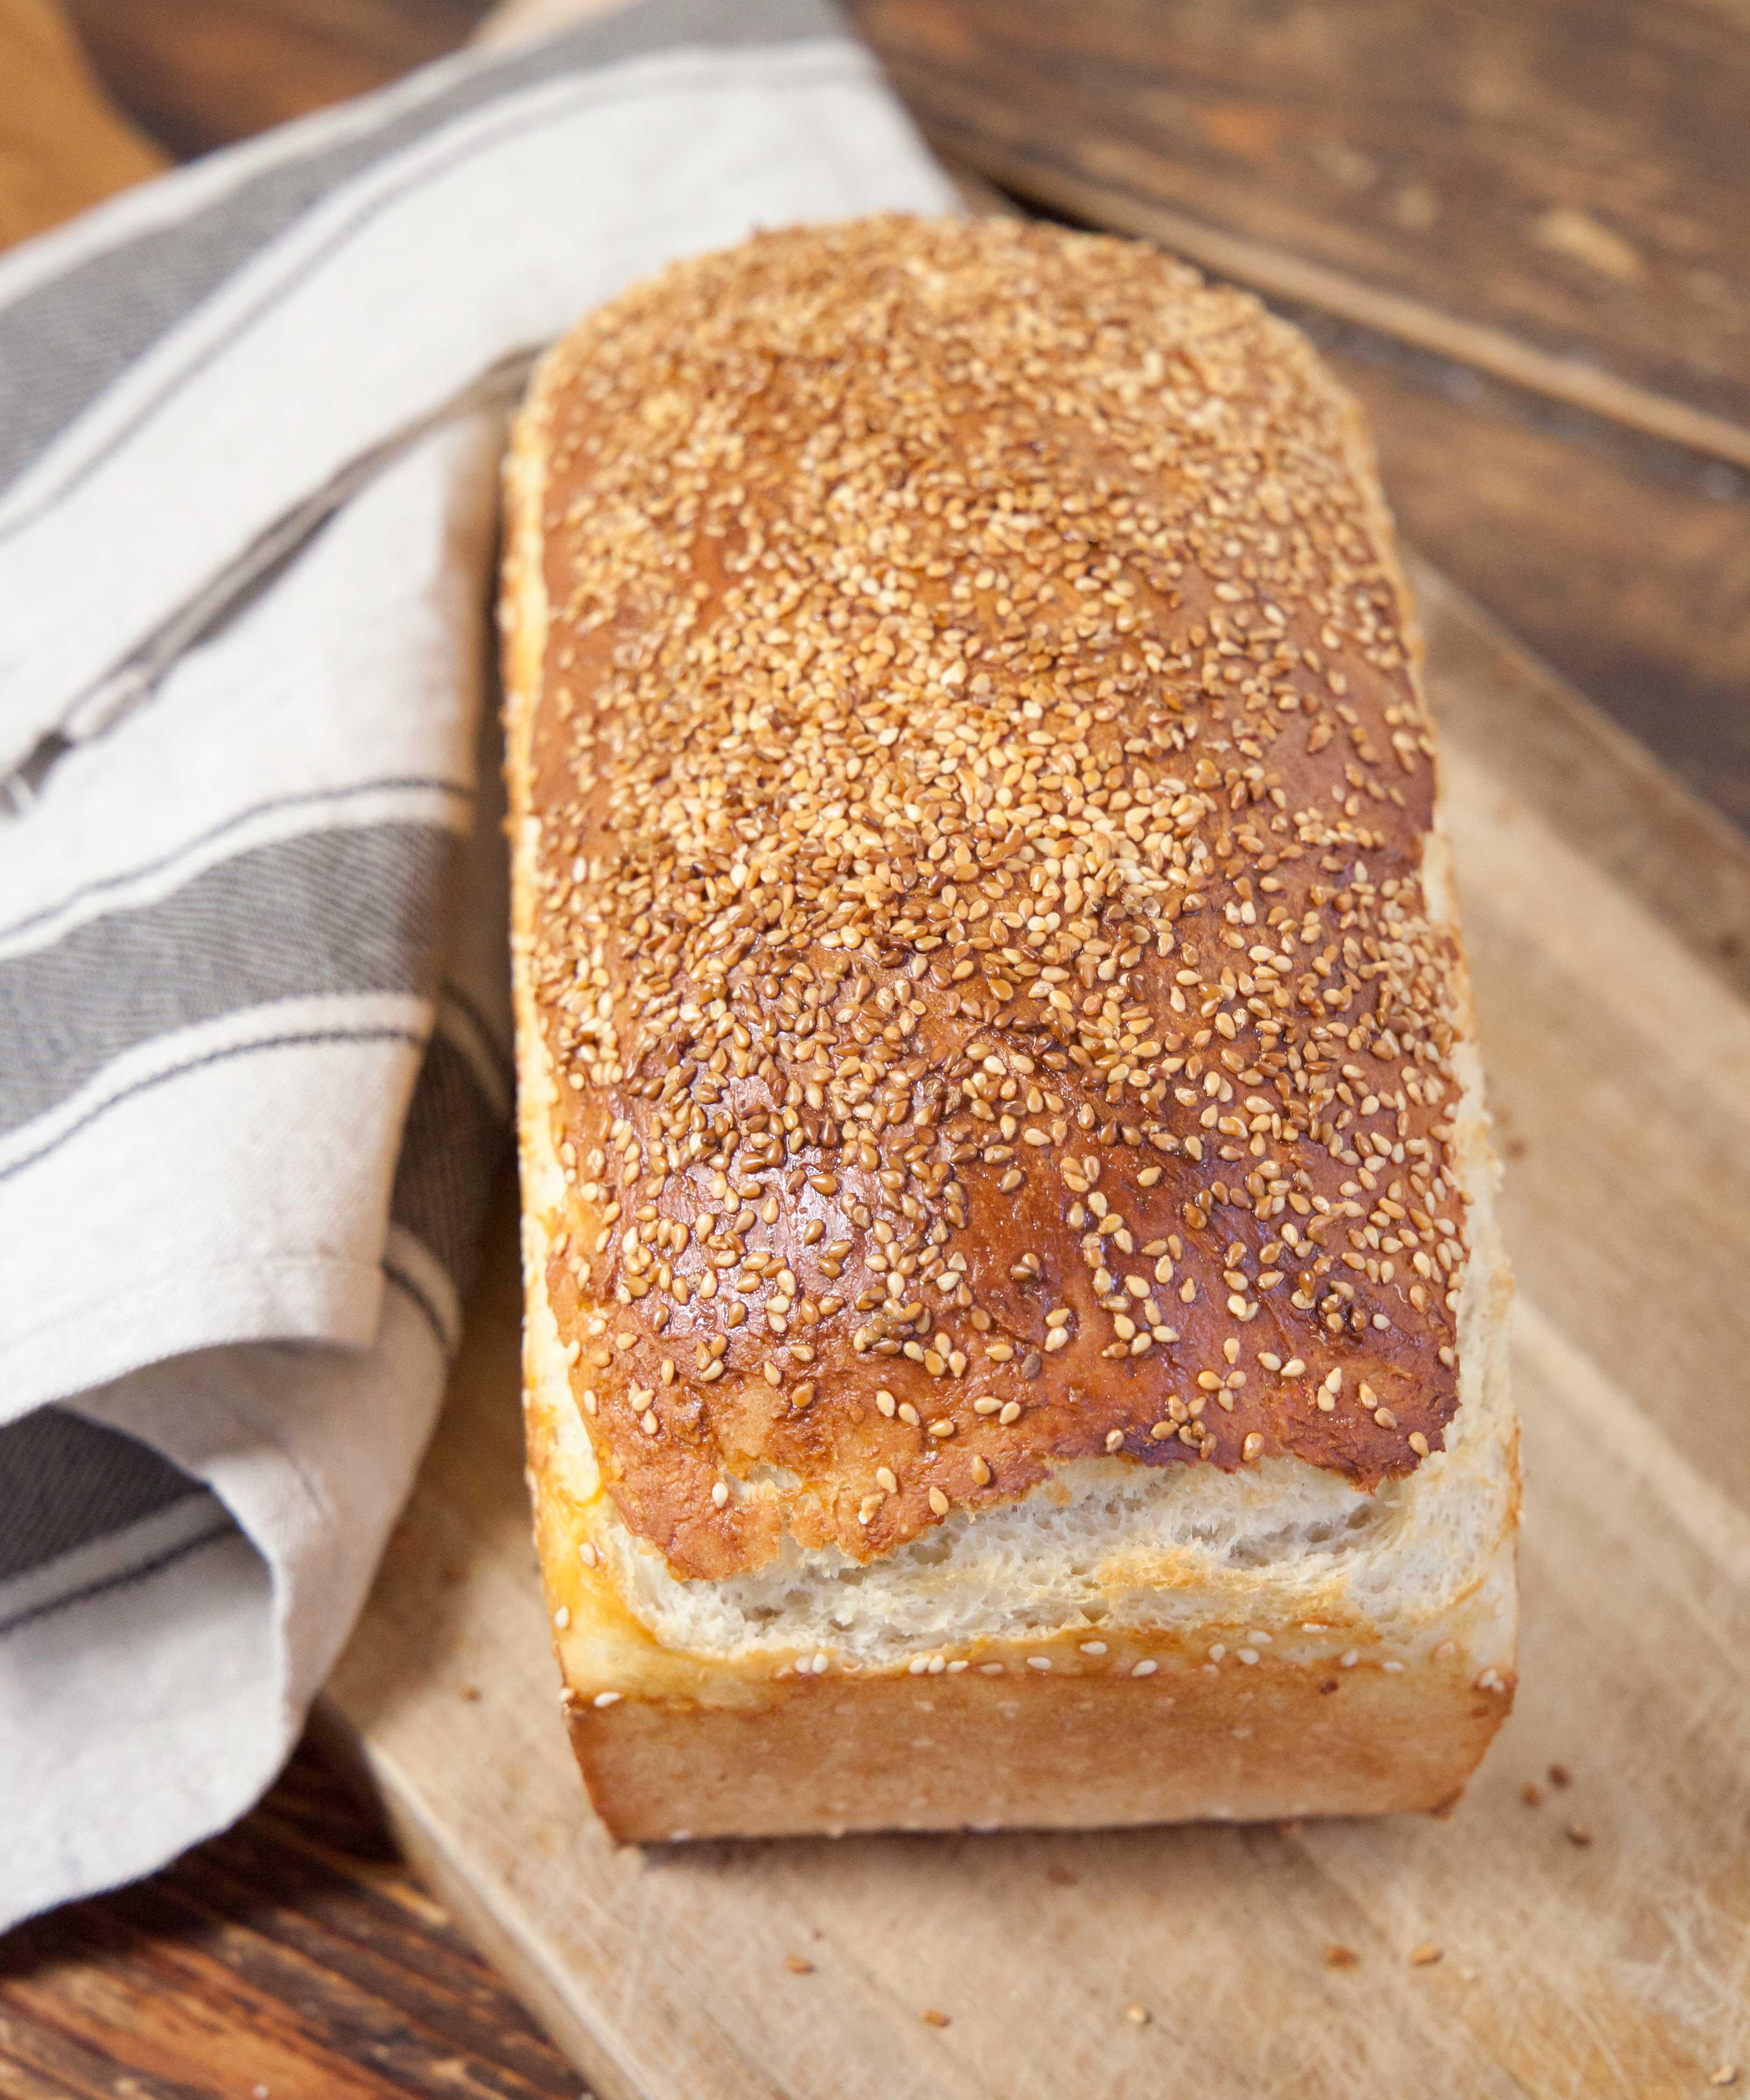 baka bröd i form